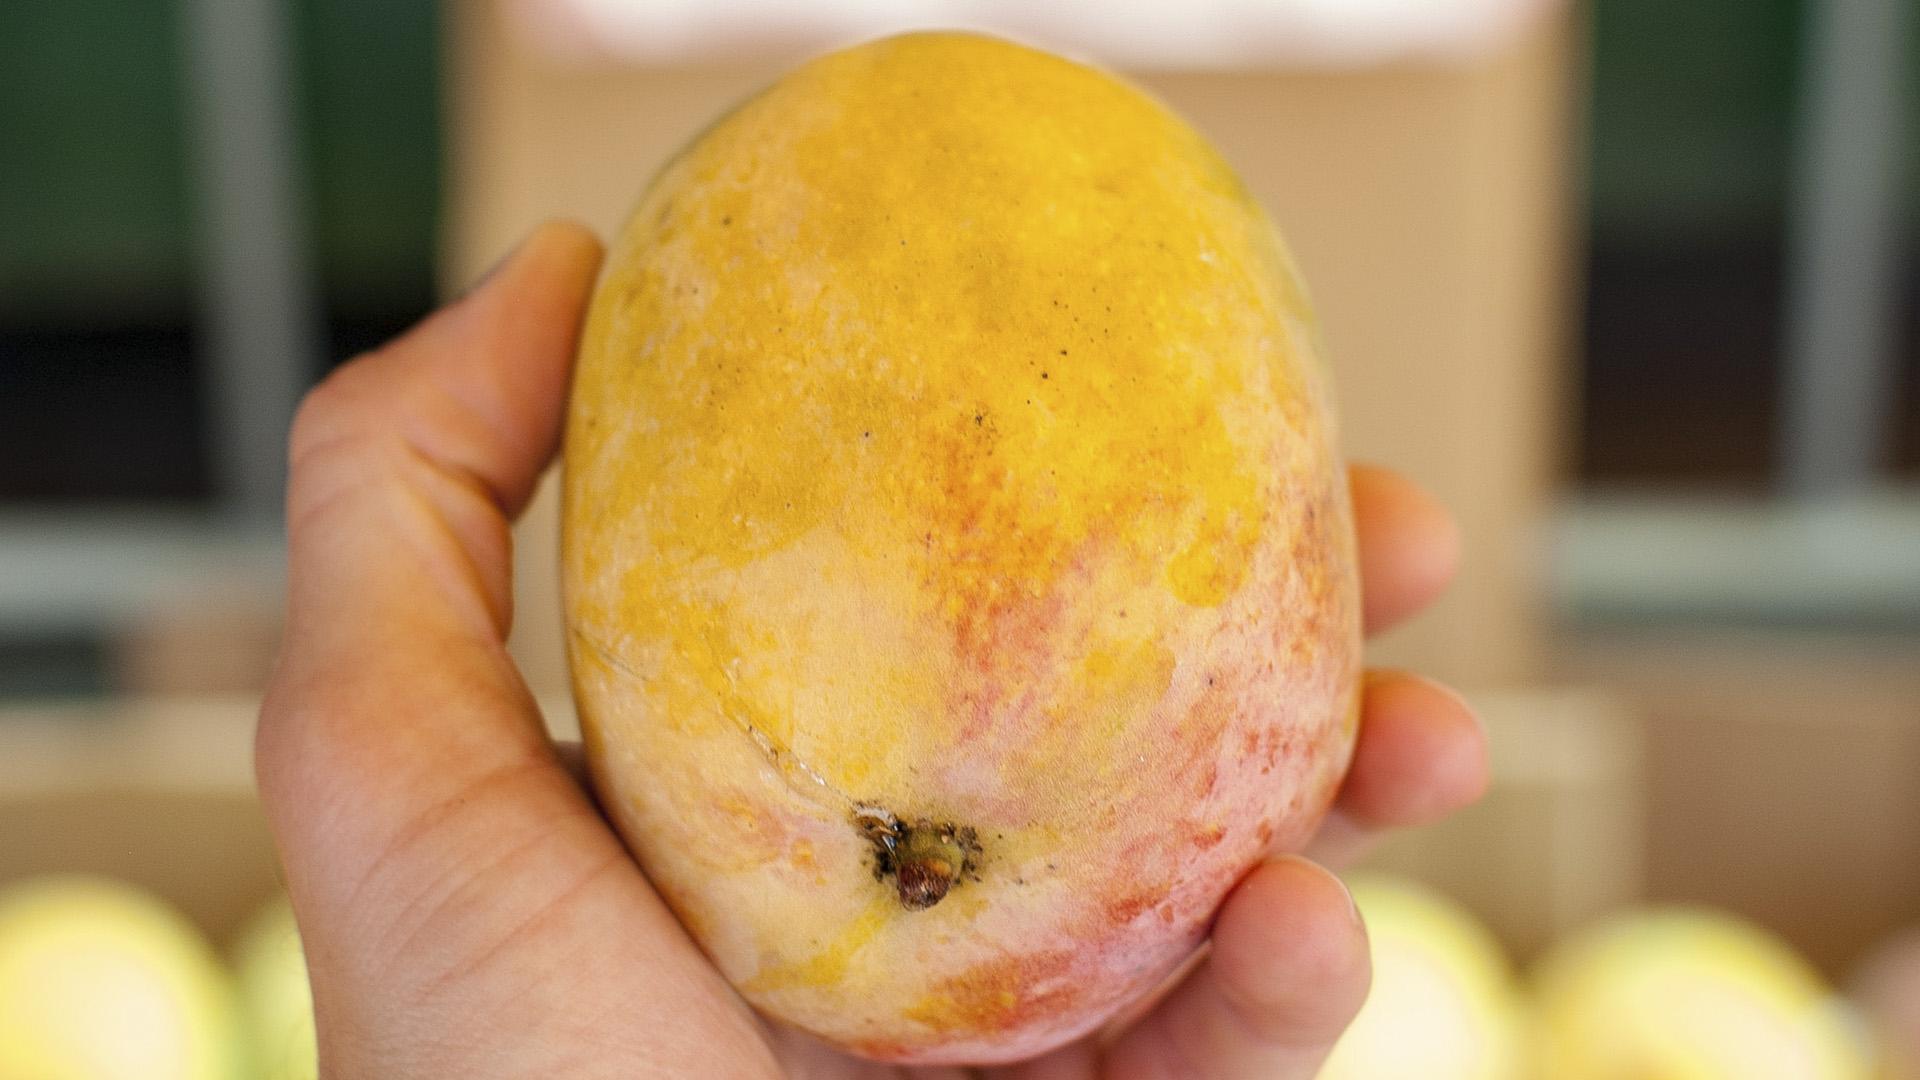 Two Brothers Grow World's Heaviest Mango Variety